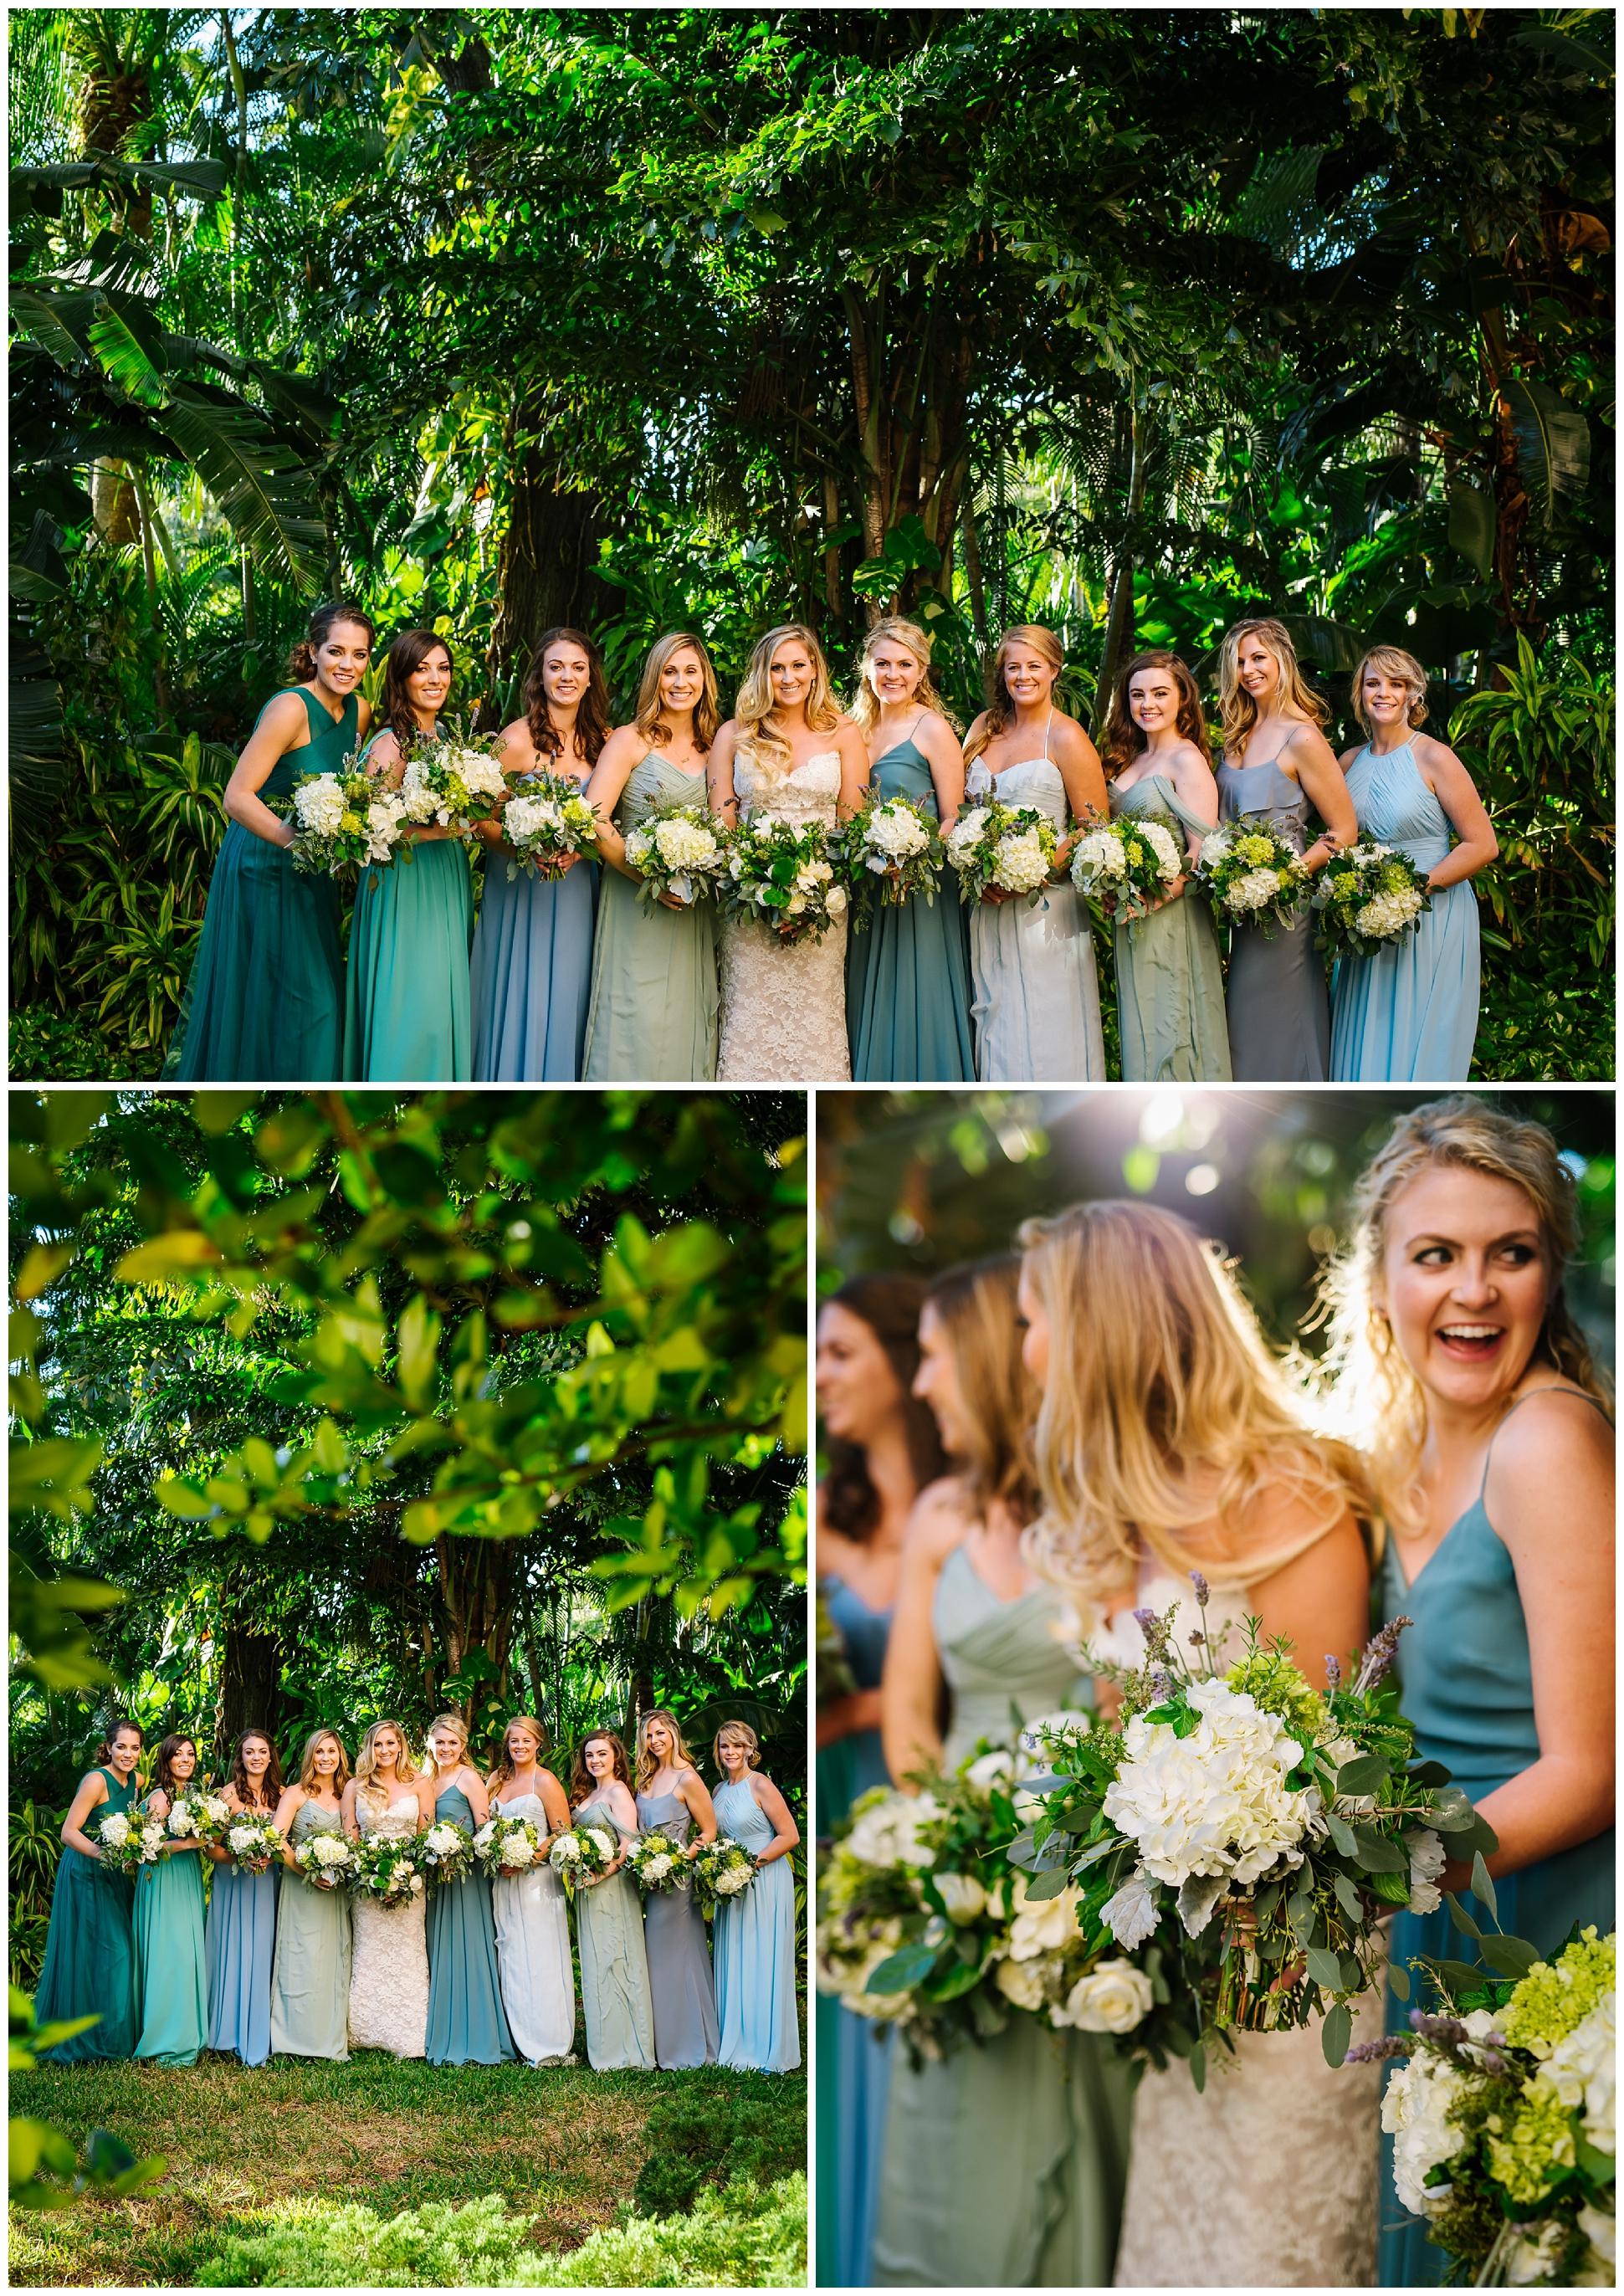 St-pete-wedding-photographer-grand-ballroom-vinoy-tea-garden-greek-luxury_0140.jpg